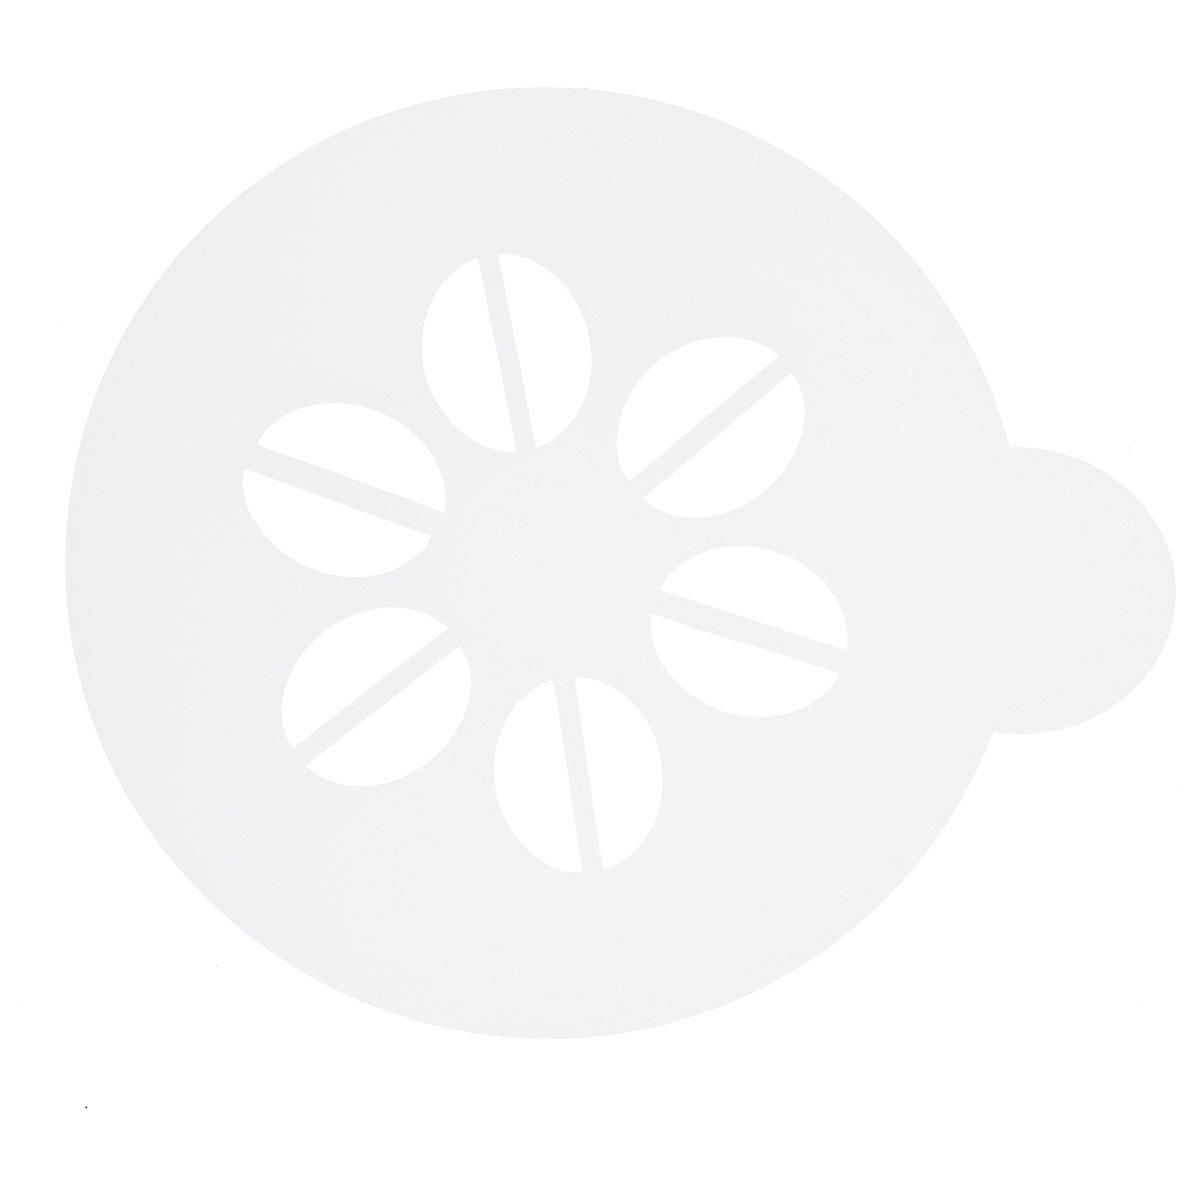 Трафарет на кофе и десерты Леденцовая фабрика Зерна кофе, диаметр 10 см трафарет на кофе и десерты леденцовая фабрика кошка с рыбой диаметр 10 см